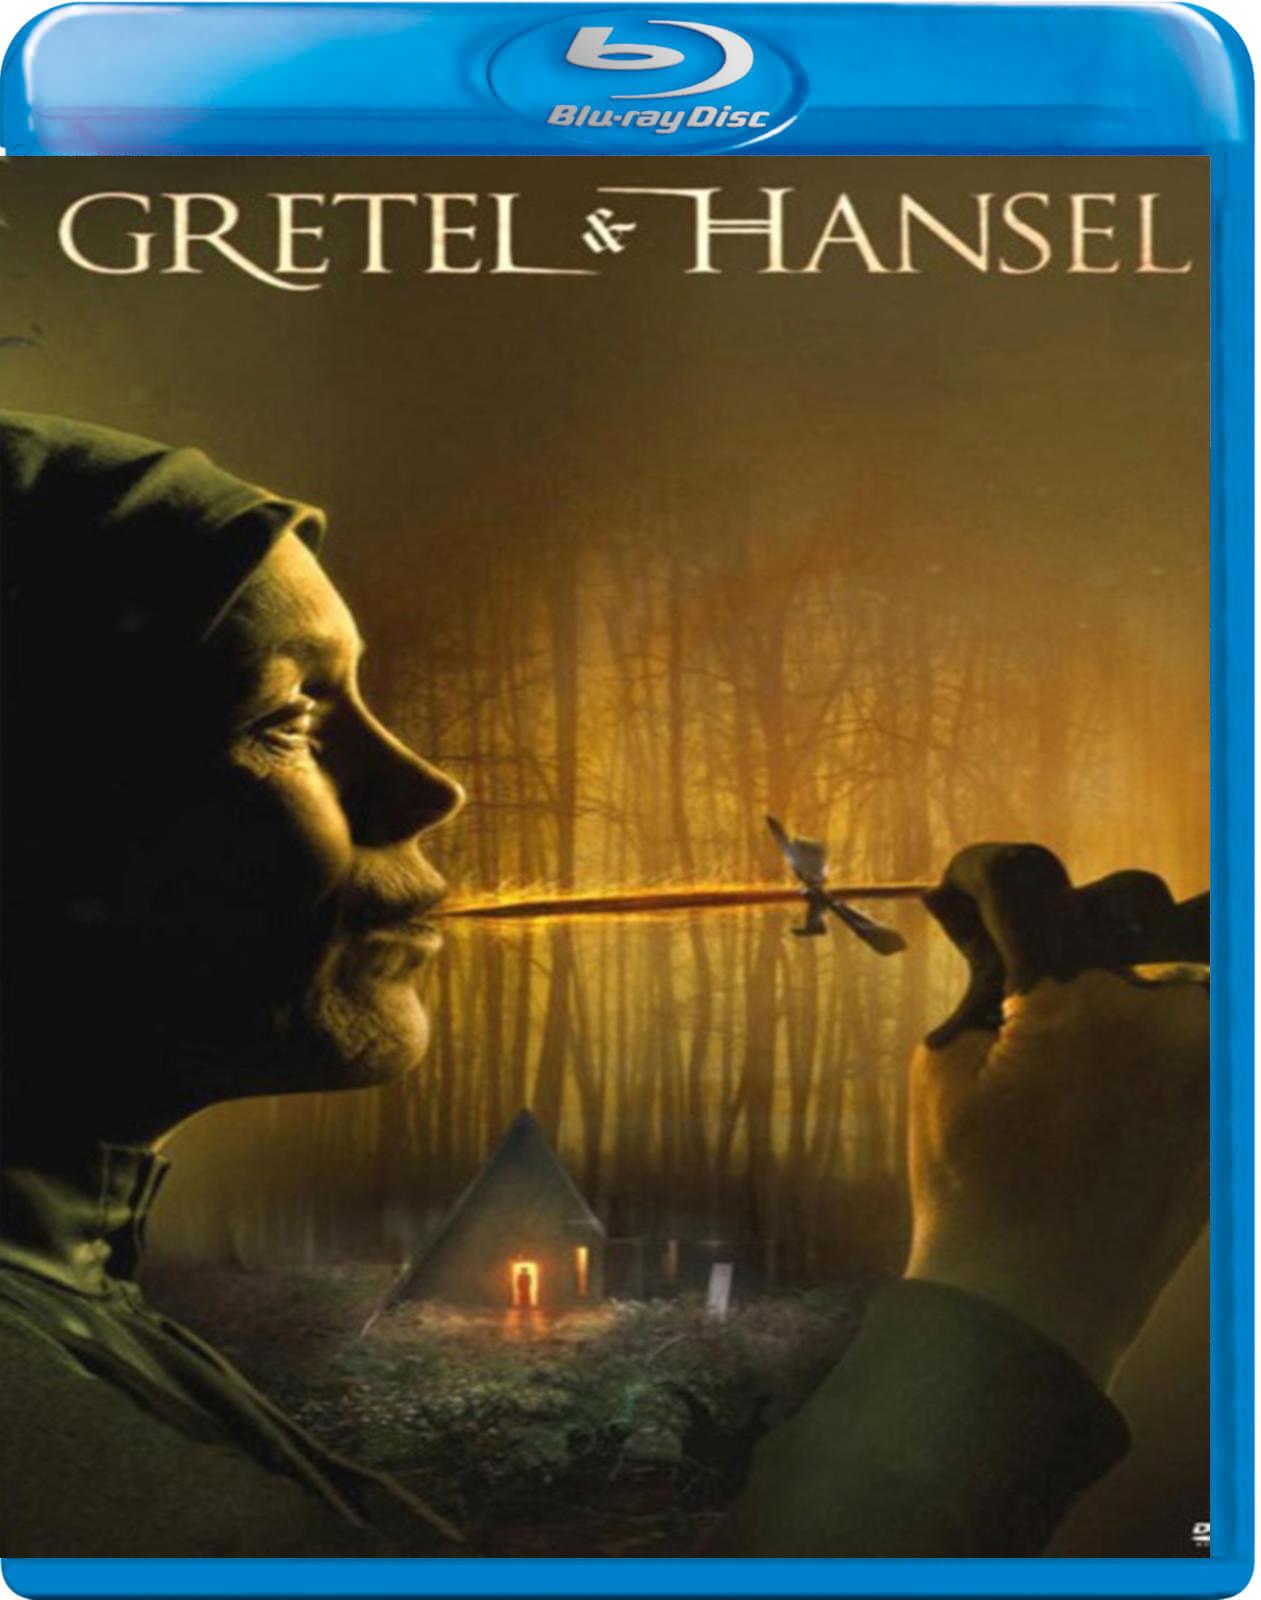 Gretel & Hansel [2020] [BD50] [Latino]